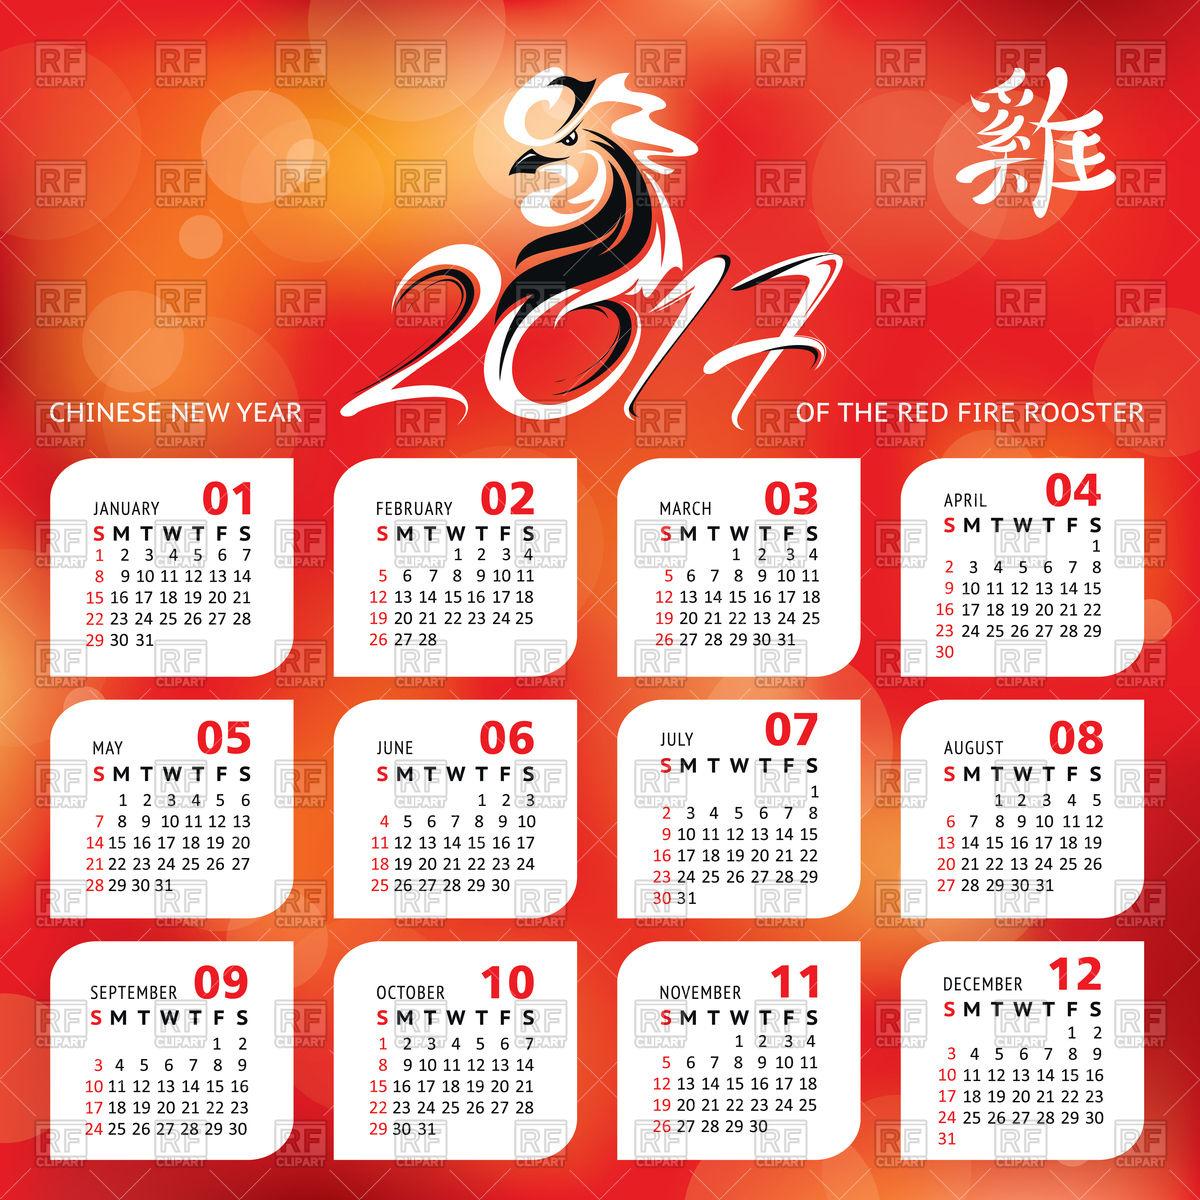 Calendar for 2017, rooster.